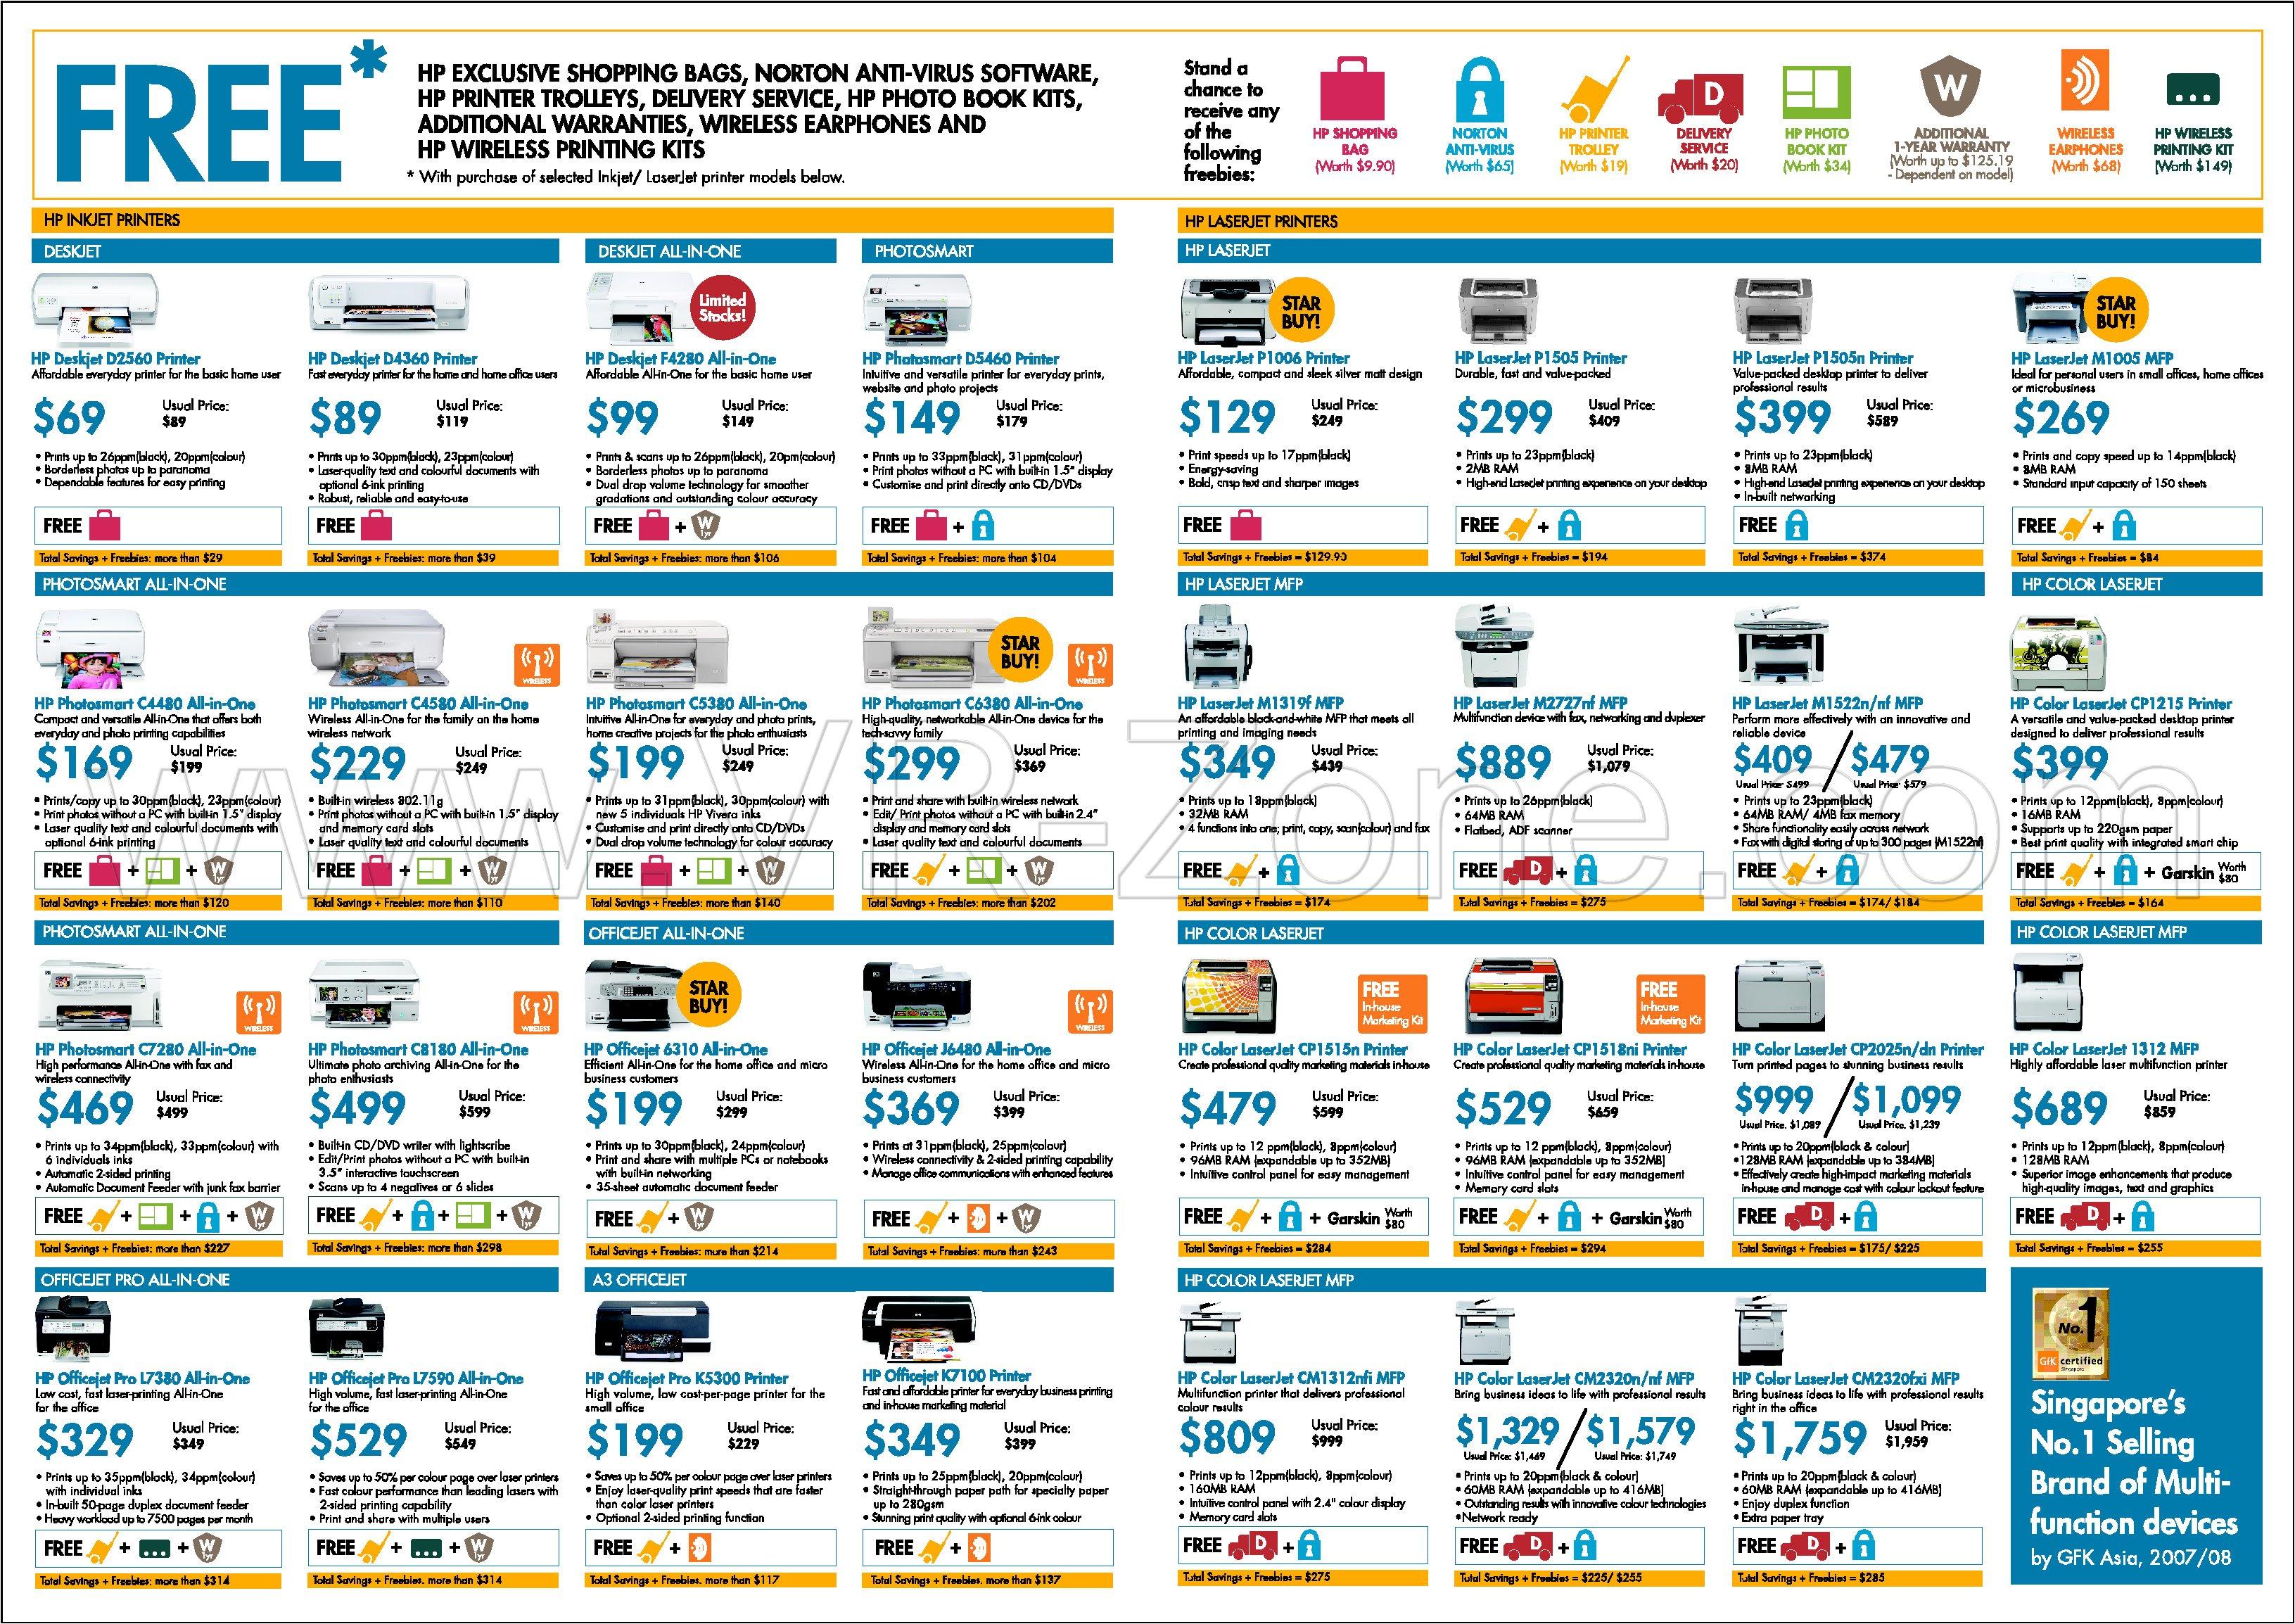 HP Printer 2 VR-Zone IT SHOW 2009 Price List Brochure Flyer